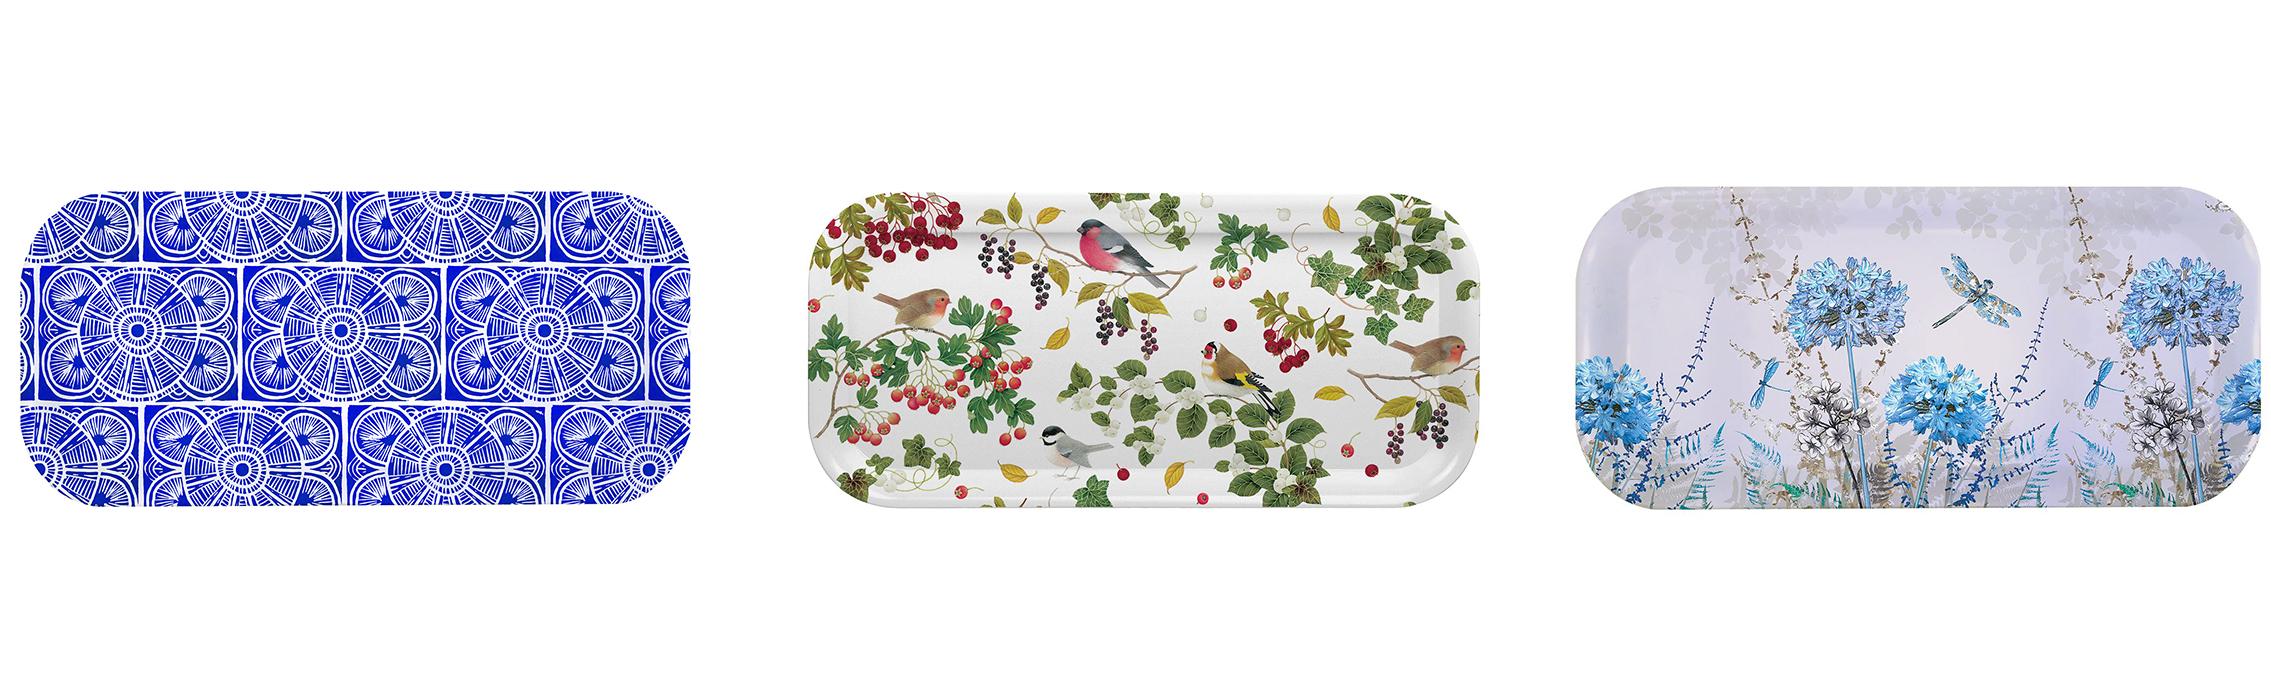 Melamaster custom printed melamine trays